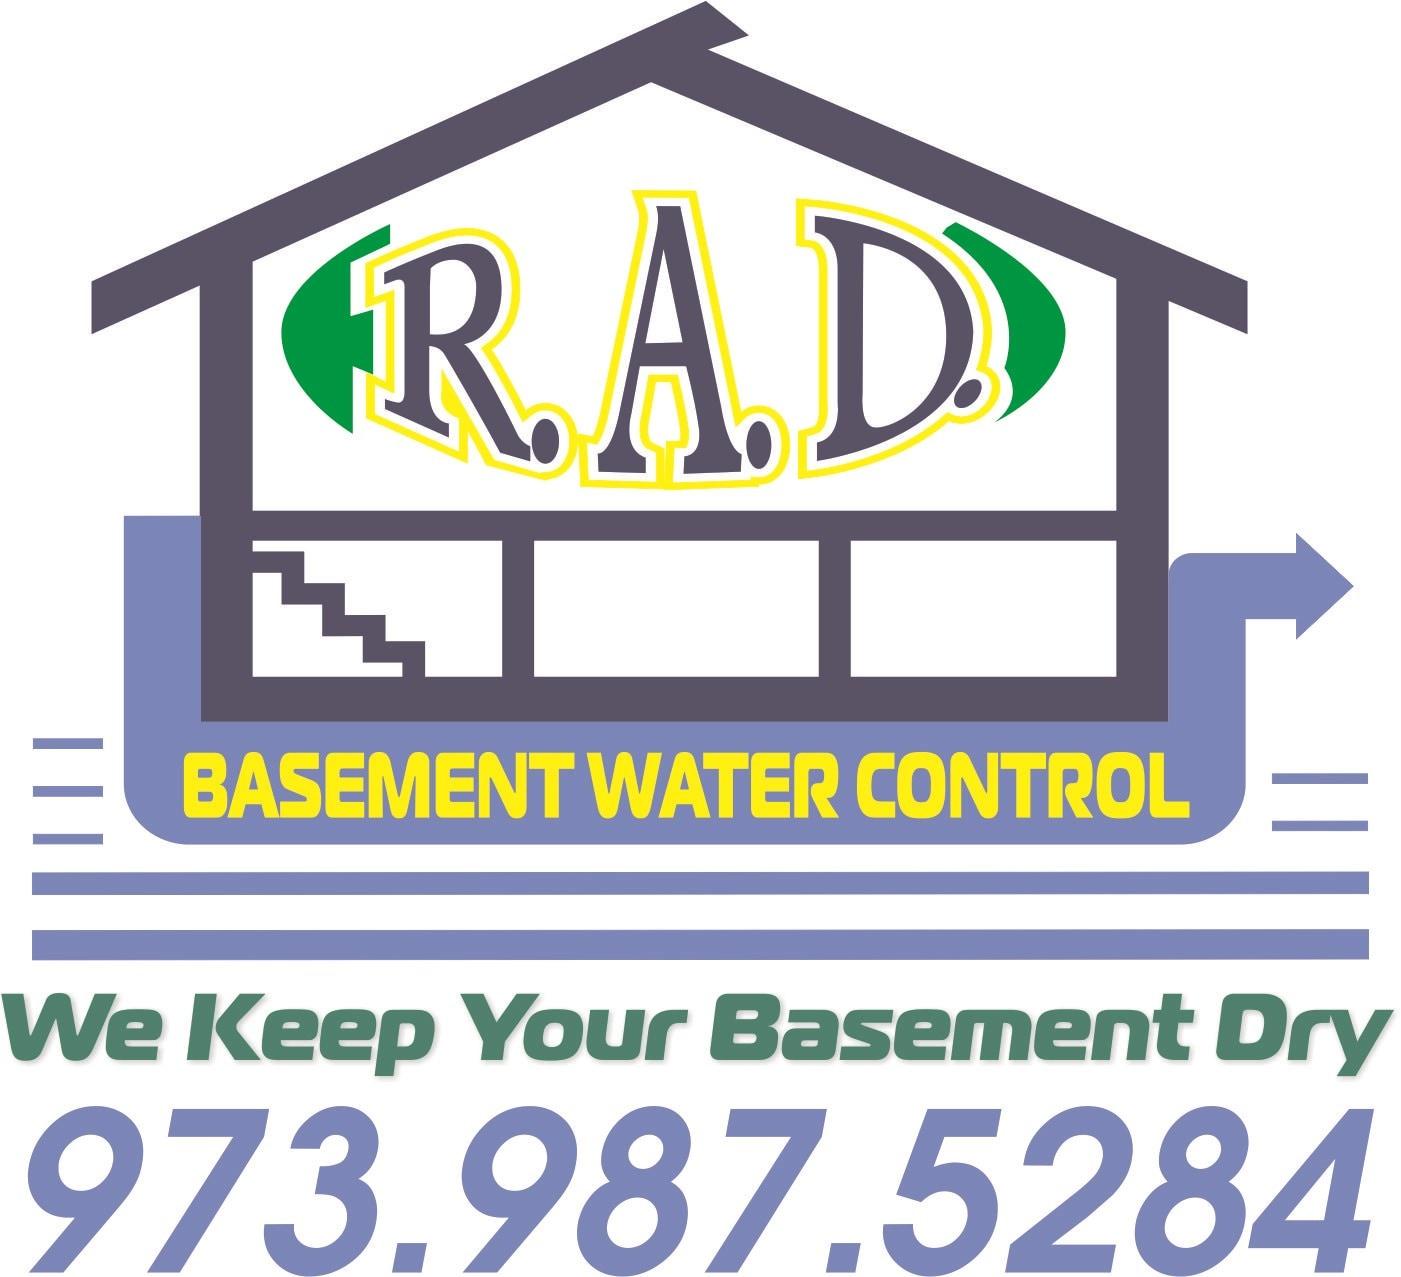 RAD Basement Water Control llc